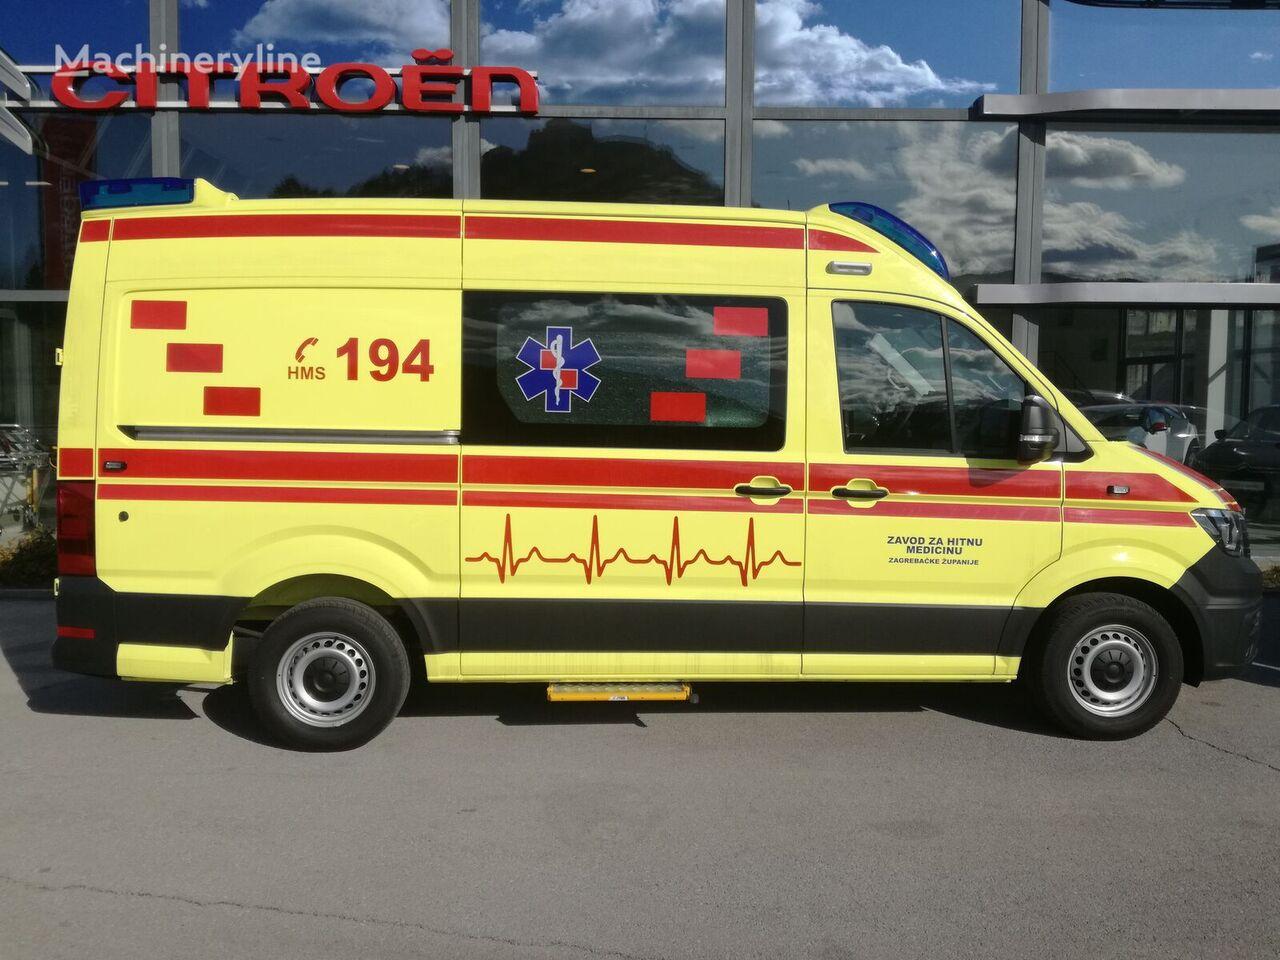 yeni VOLKSWAGEN Crafter L3H2 minibüs ambulans aracı